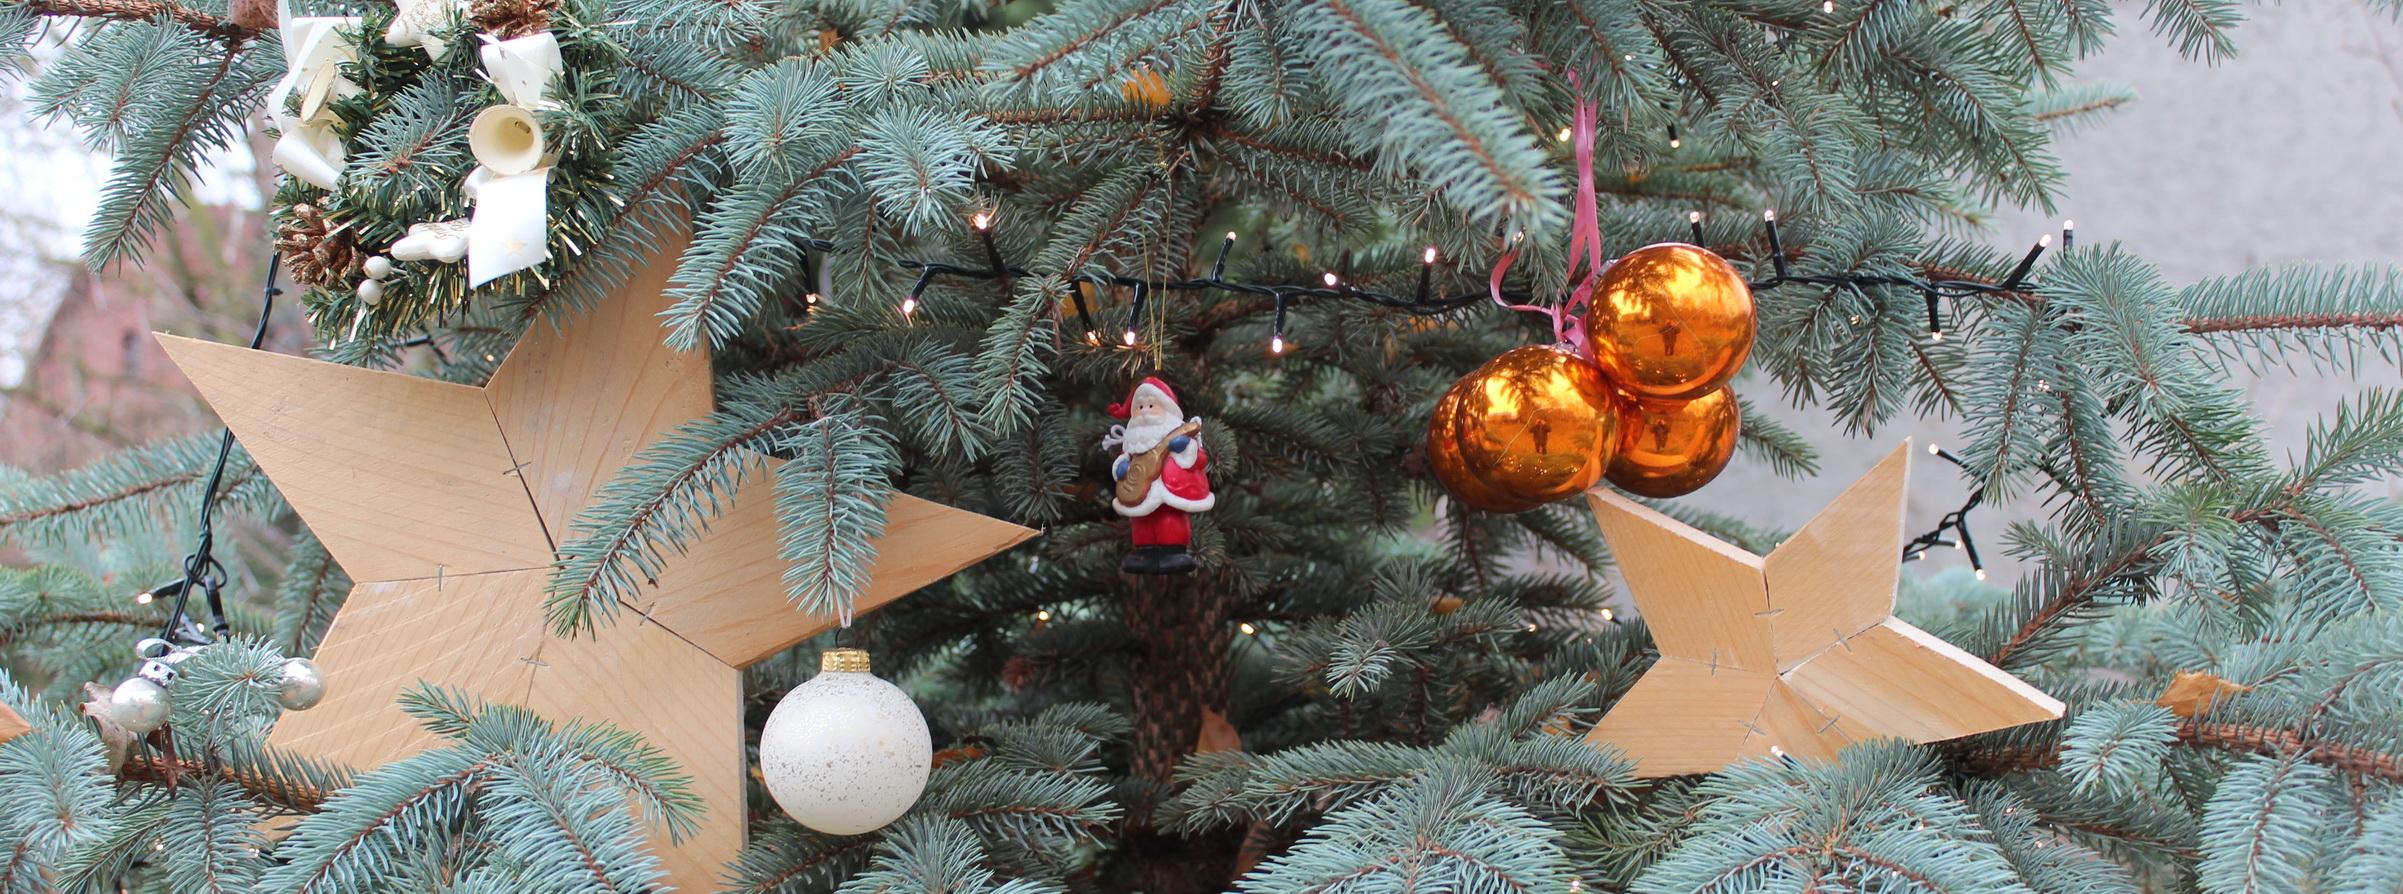 Blog AN NA wünscht eine Frohe Adventszeit